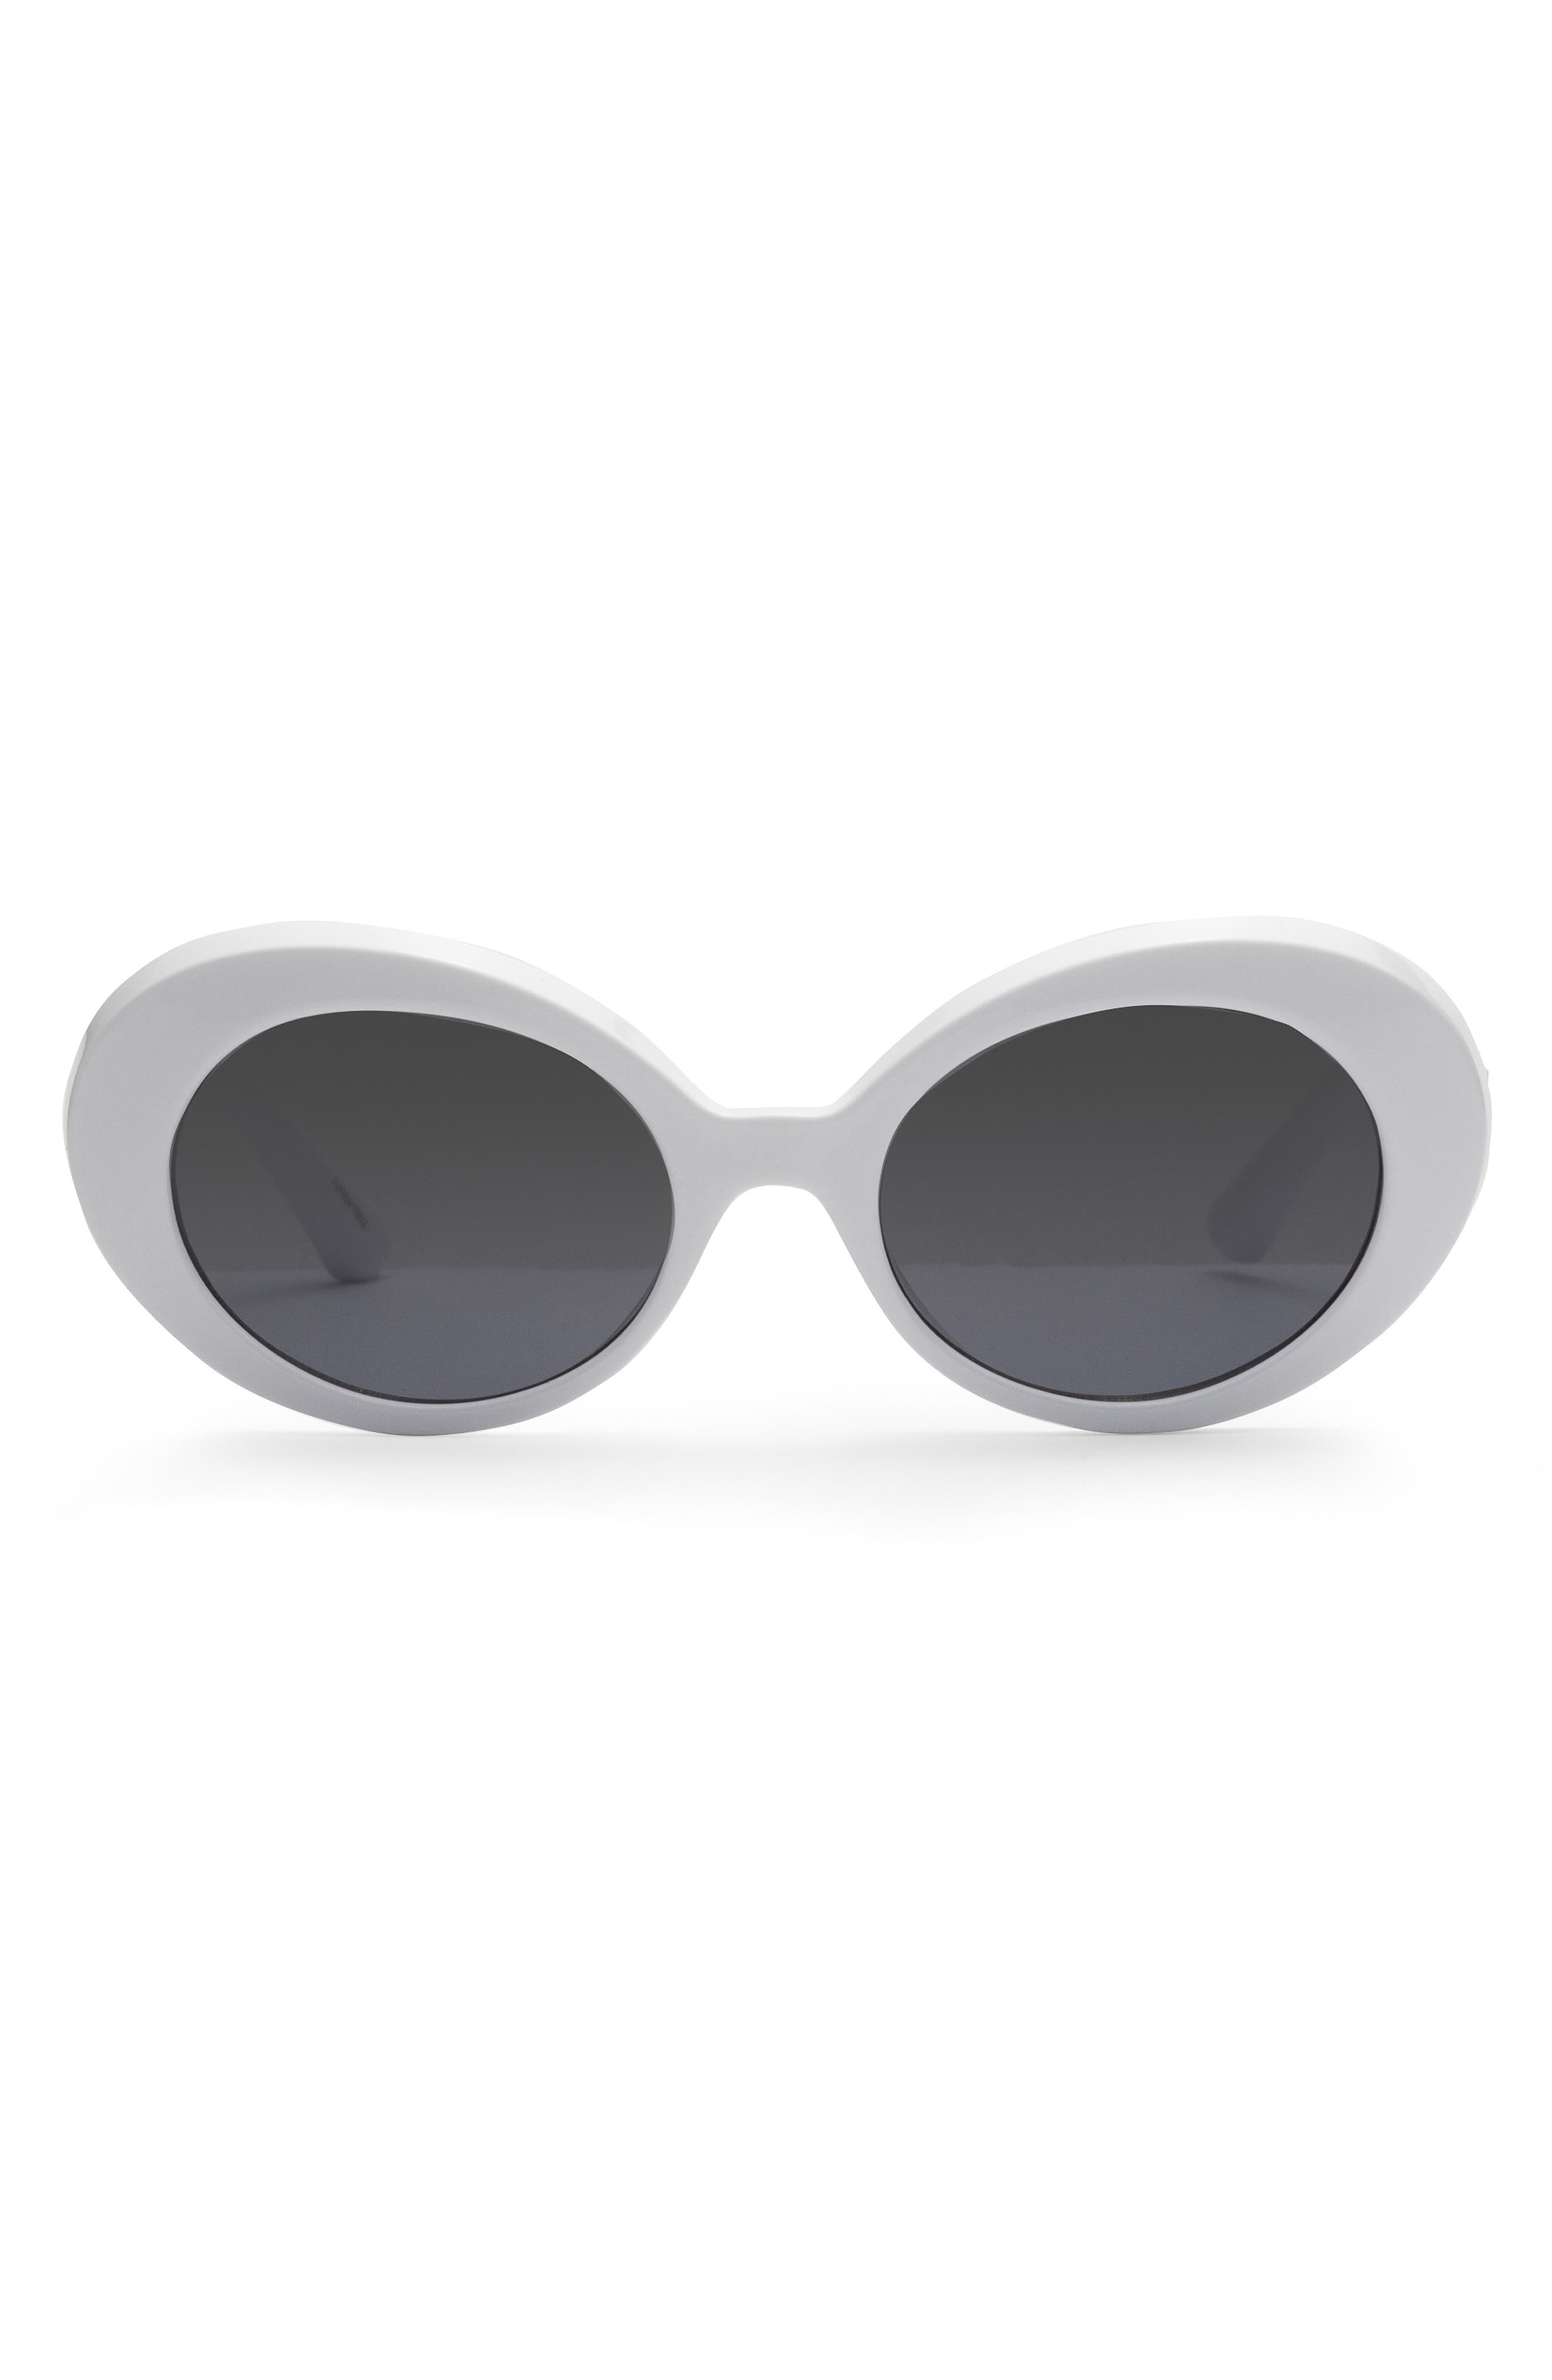 Junia Wowza 4m Oval Sunglasses - White